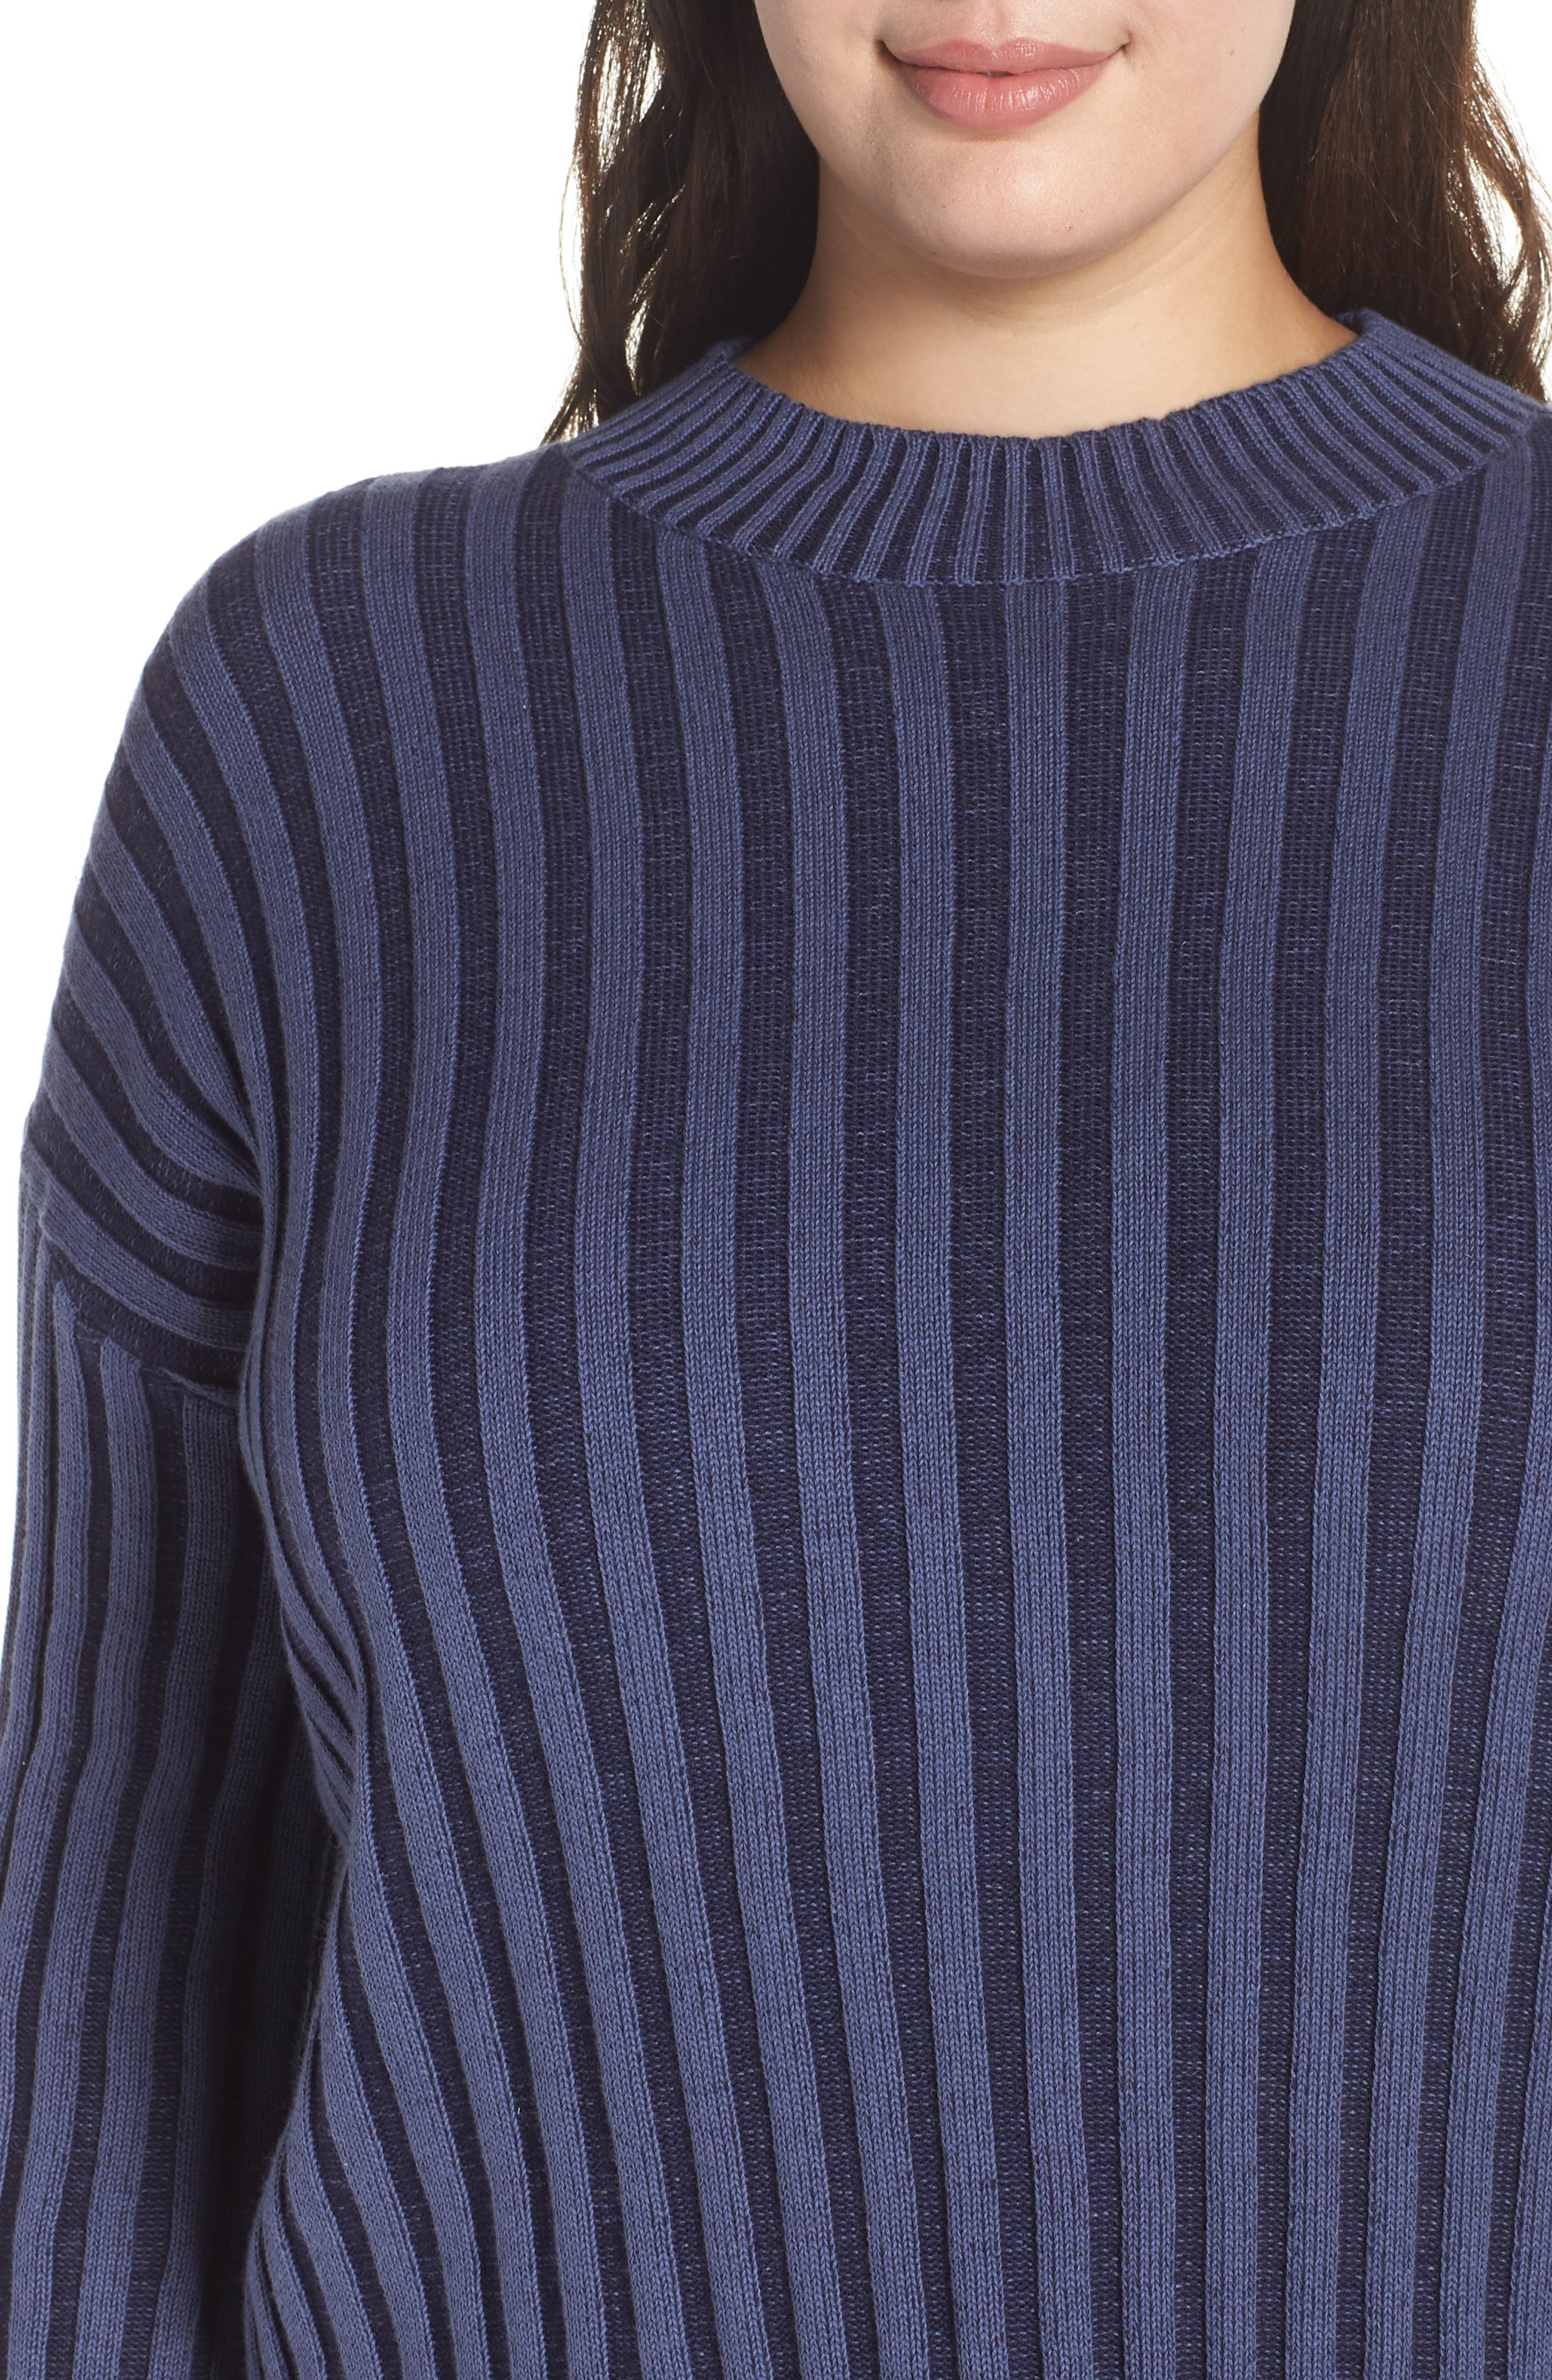 Shadow Rib Crop Sweater,                             Alternate thumbnail 10, color,                             NAVY EVENING